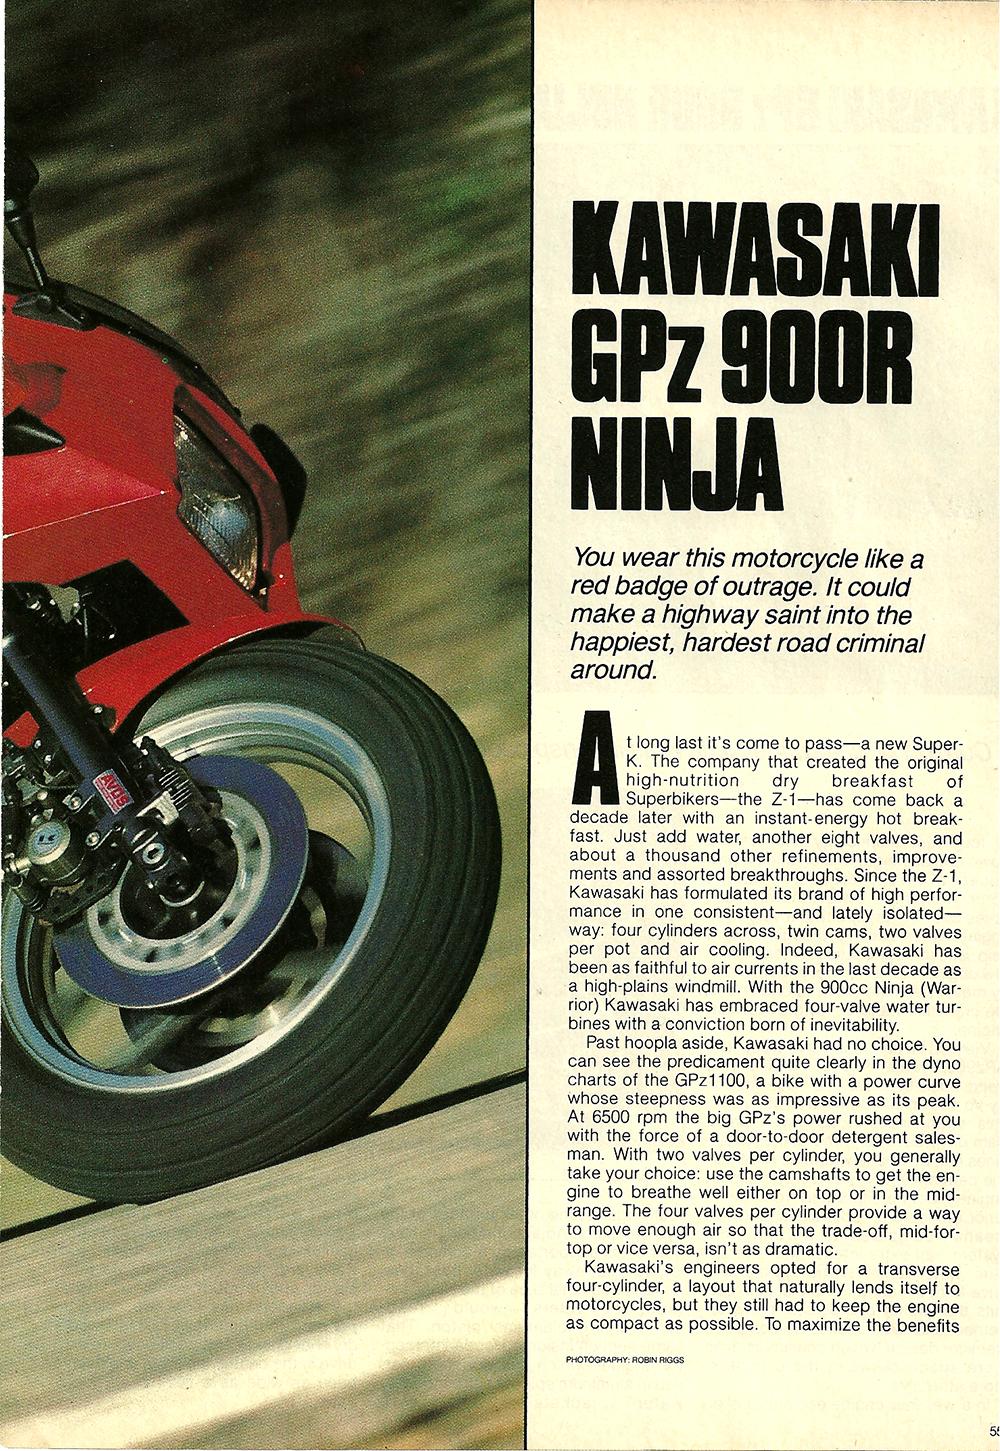 1984 Kawasaki GPz 900R Ninja road test 02.jpg